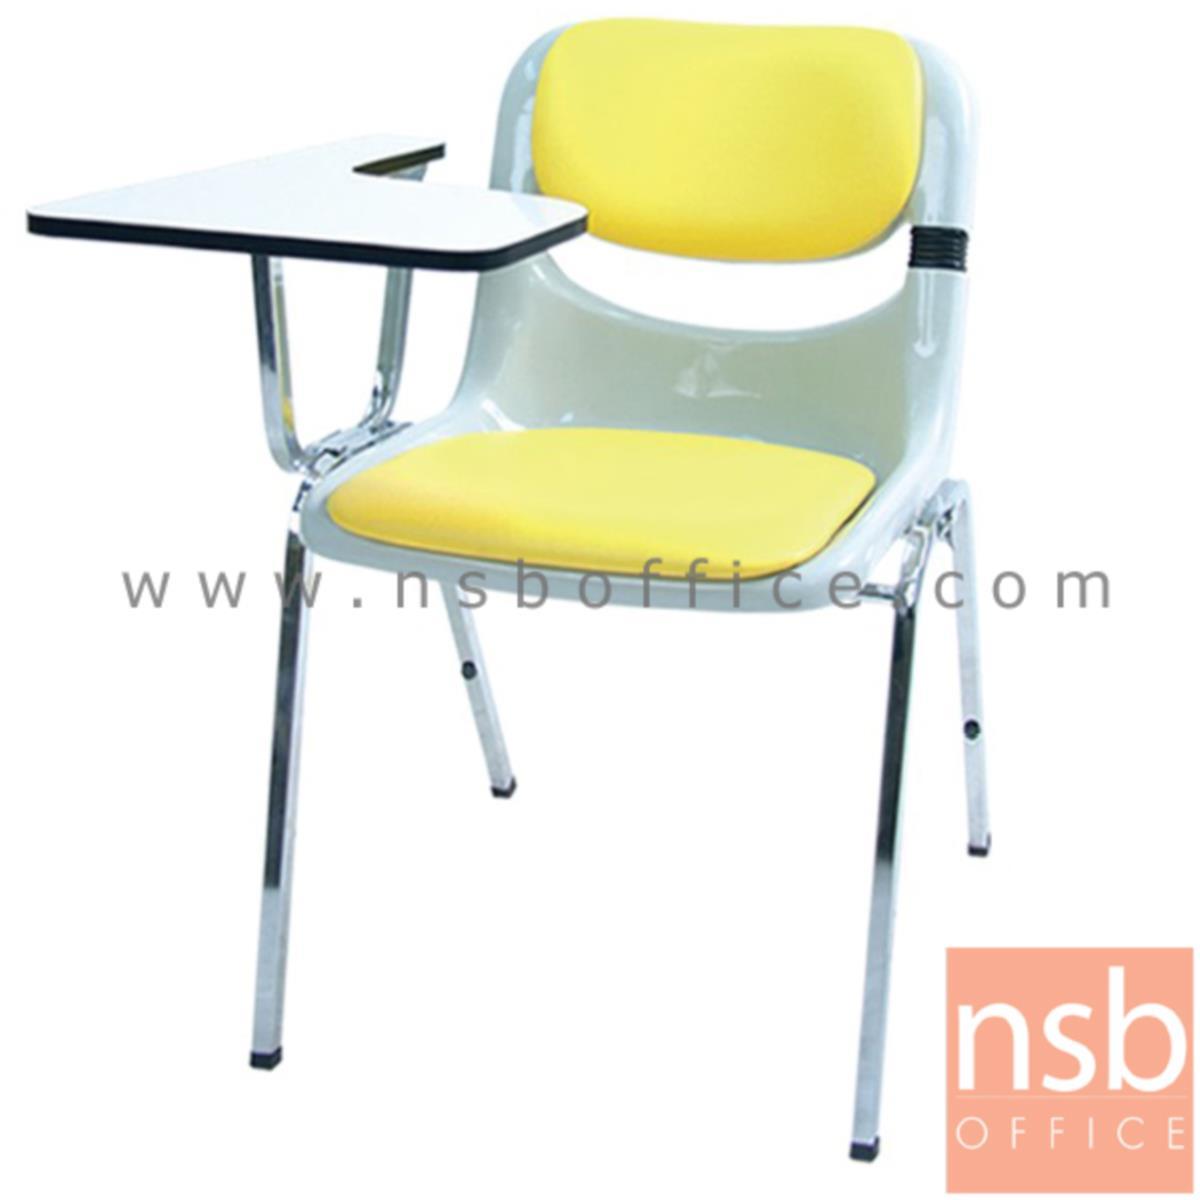 B07A085:เก้าอี้เลคเชอร์เฟรมโพลี่ รุ่น PEXC-20LCFV ขาเหล็กชุบโครเมี่ยม